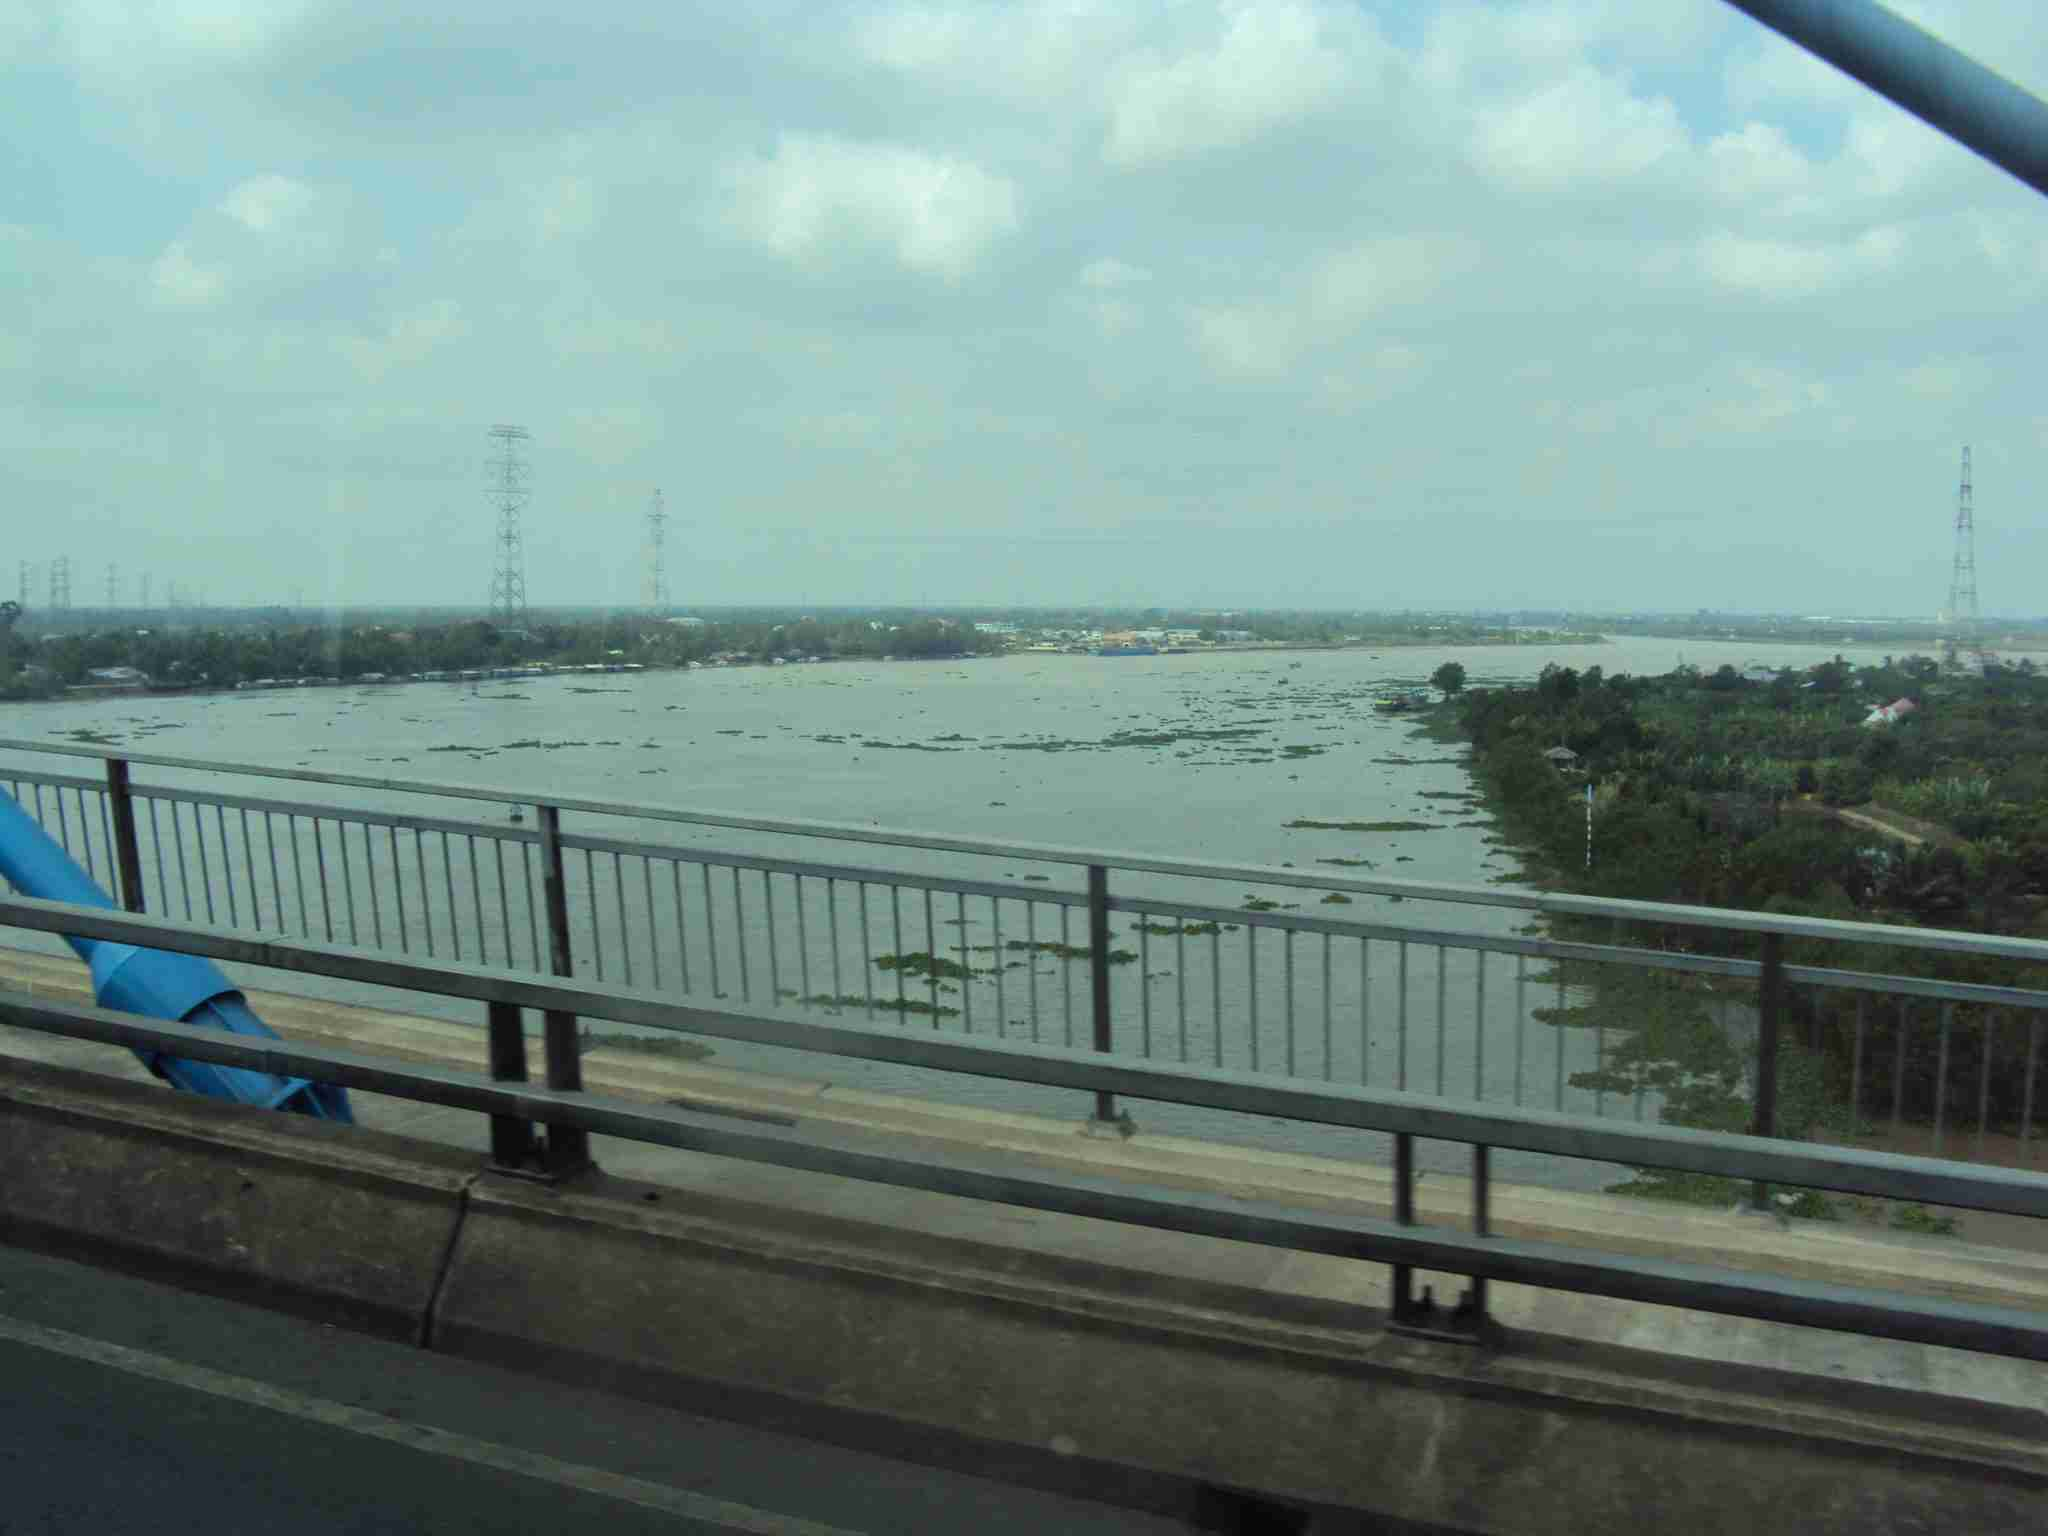 Mekong - the last time